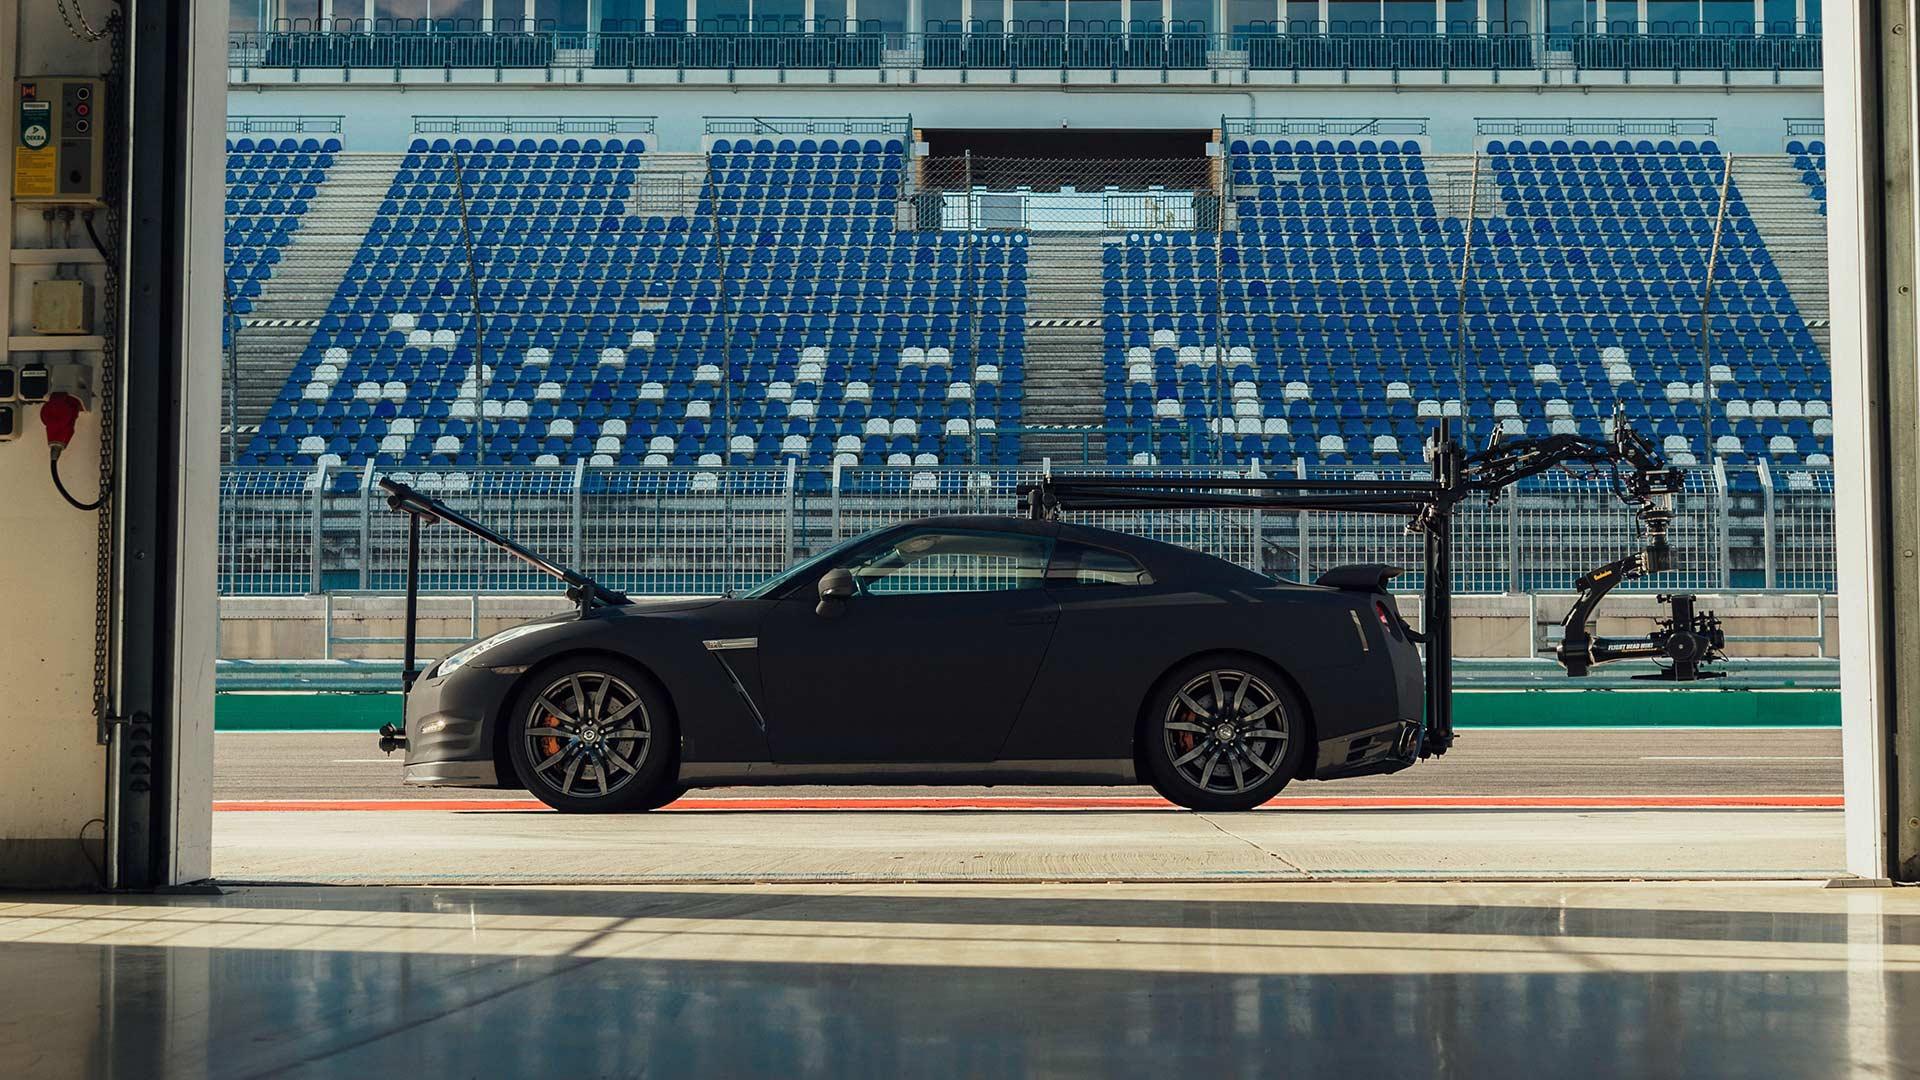 2020 Nissan GTR NISMO Camera Car